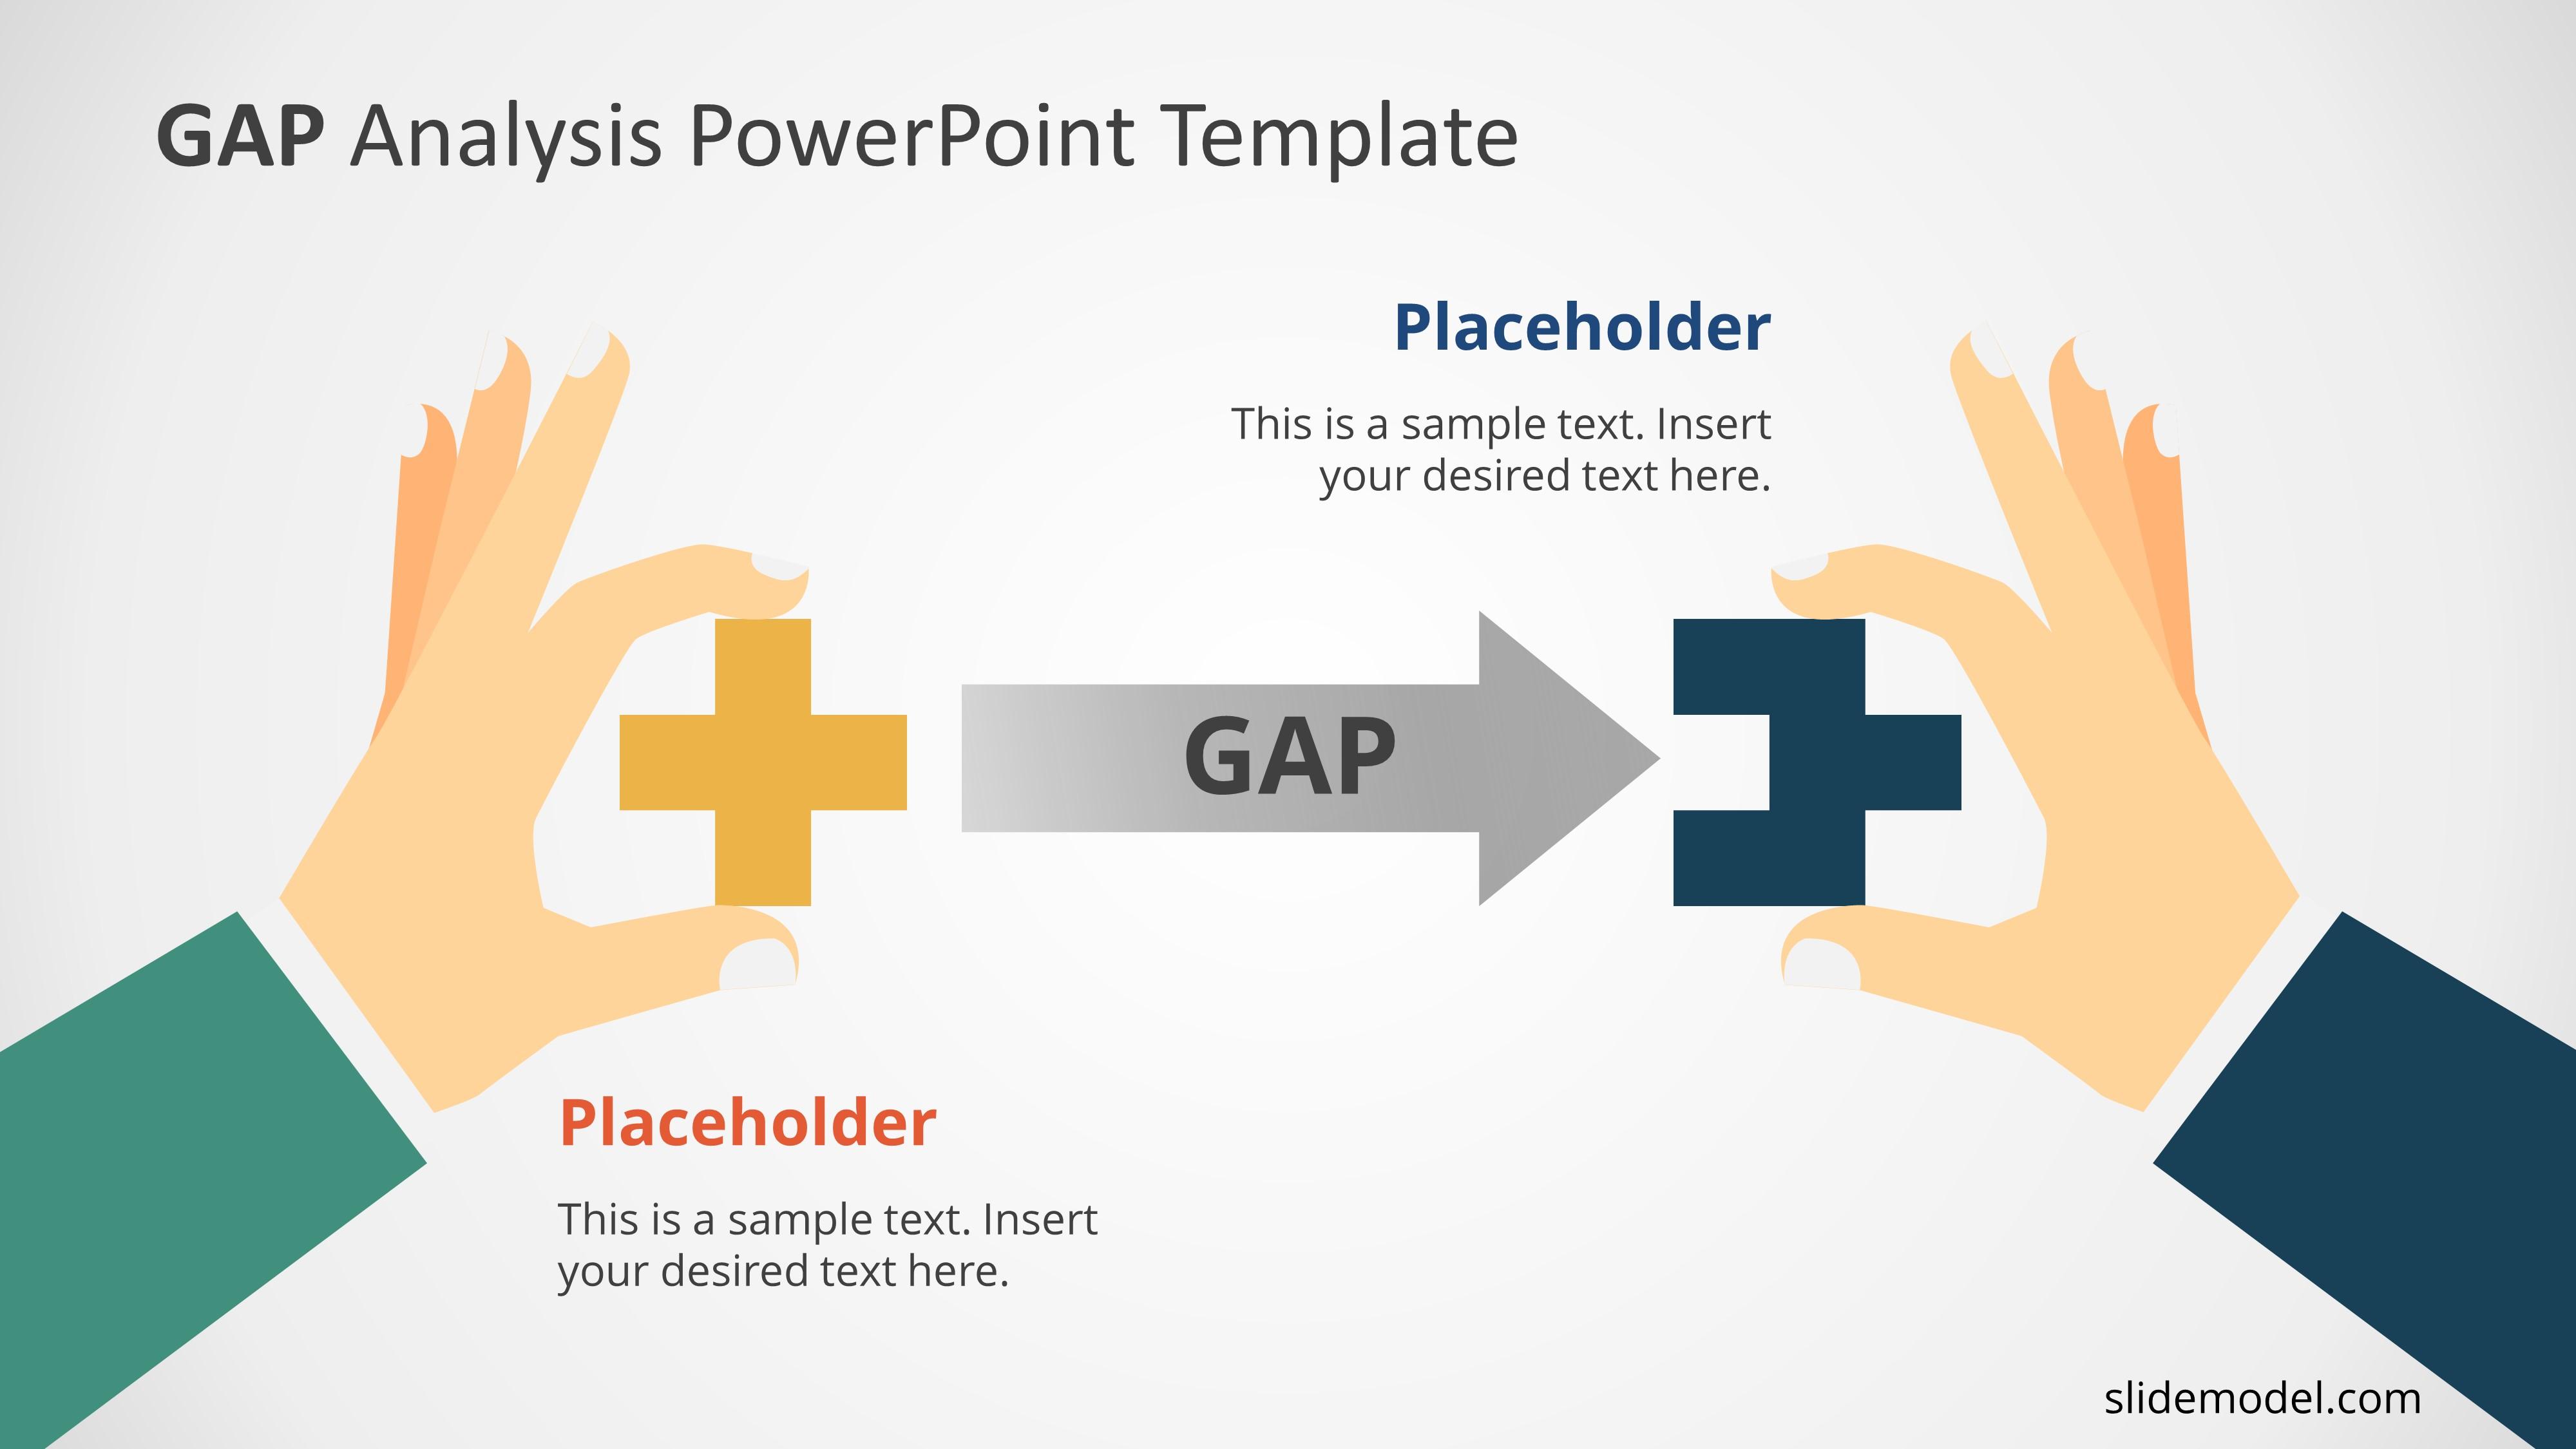 PPT GAP Analysis Template